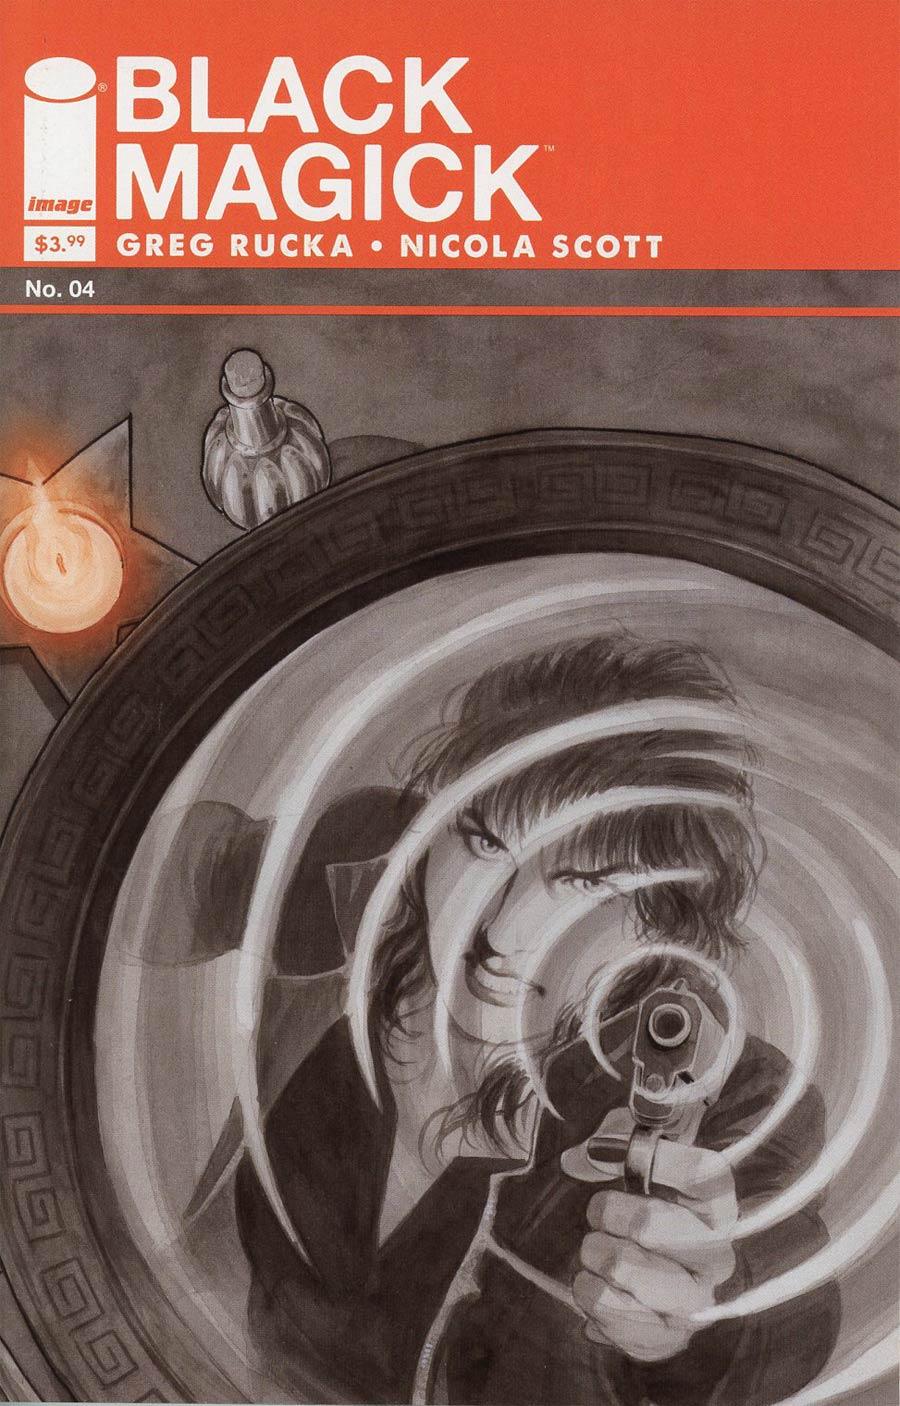 Black Magick #4 Cover A Nicola Scott